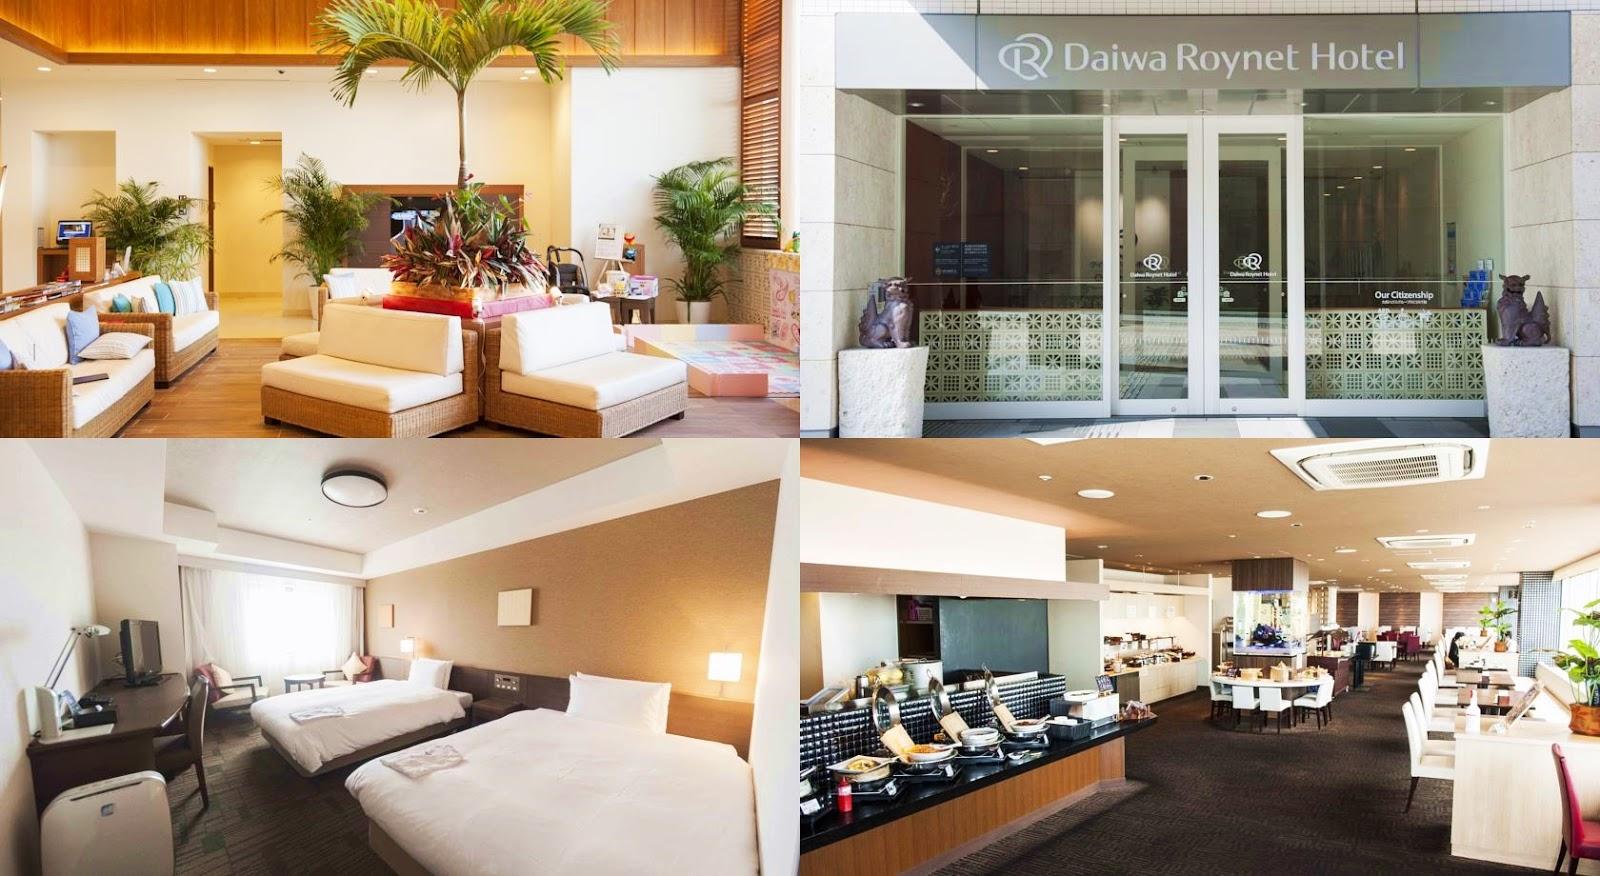 沖繩-住宿-推薦-那霸-歌町大和ROYNET酒店-Daiwa-Roynet-Hotel-Naha-Omoromachi-Okinawa-hotel-recommendation